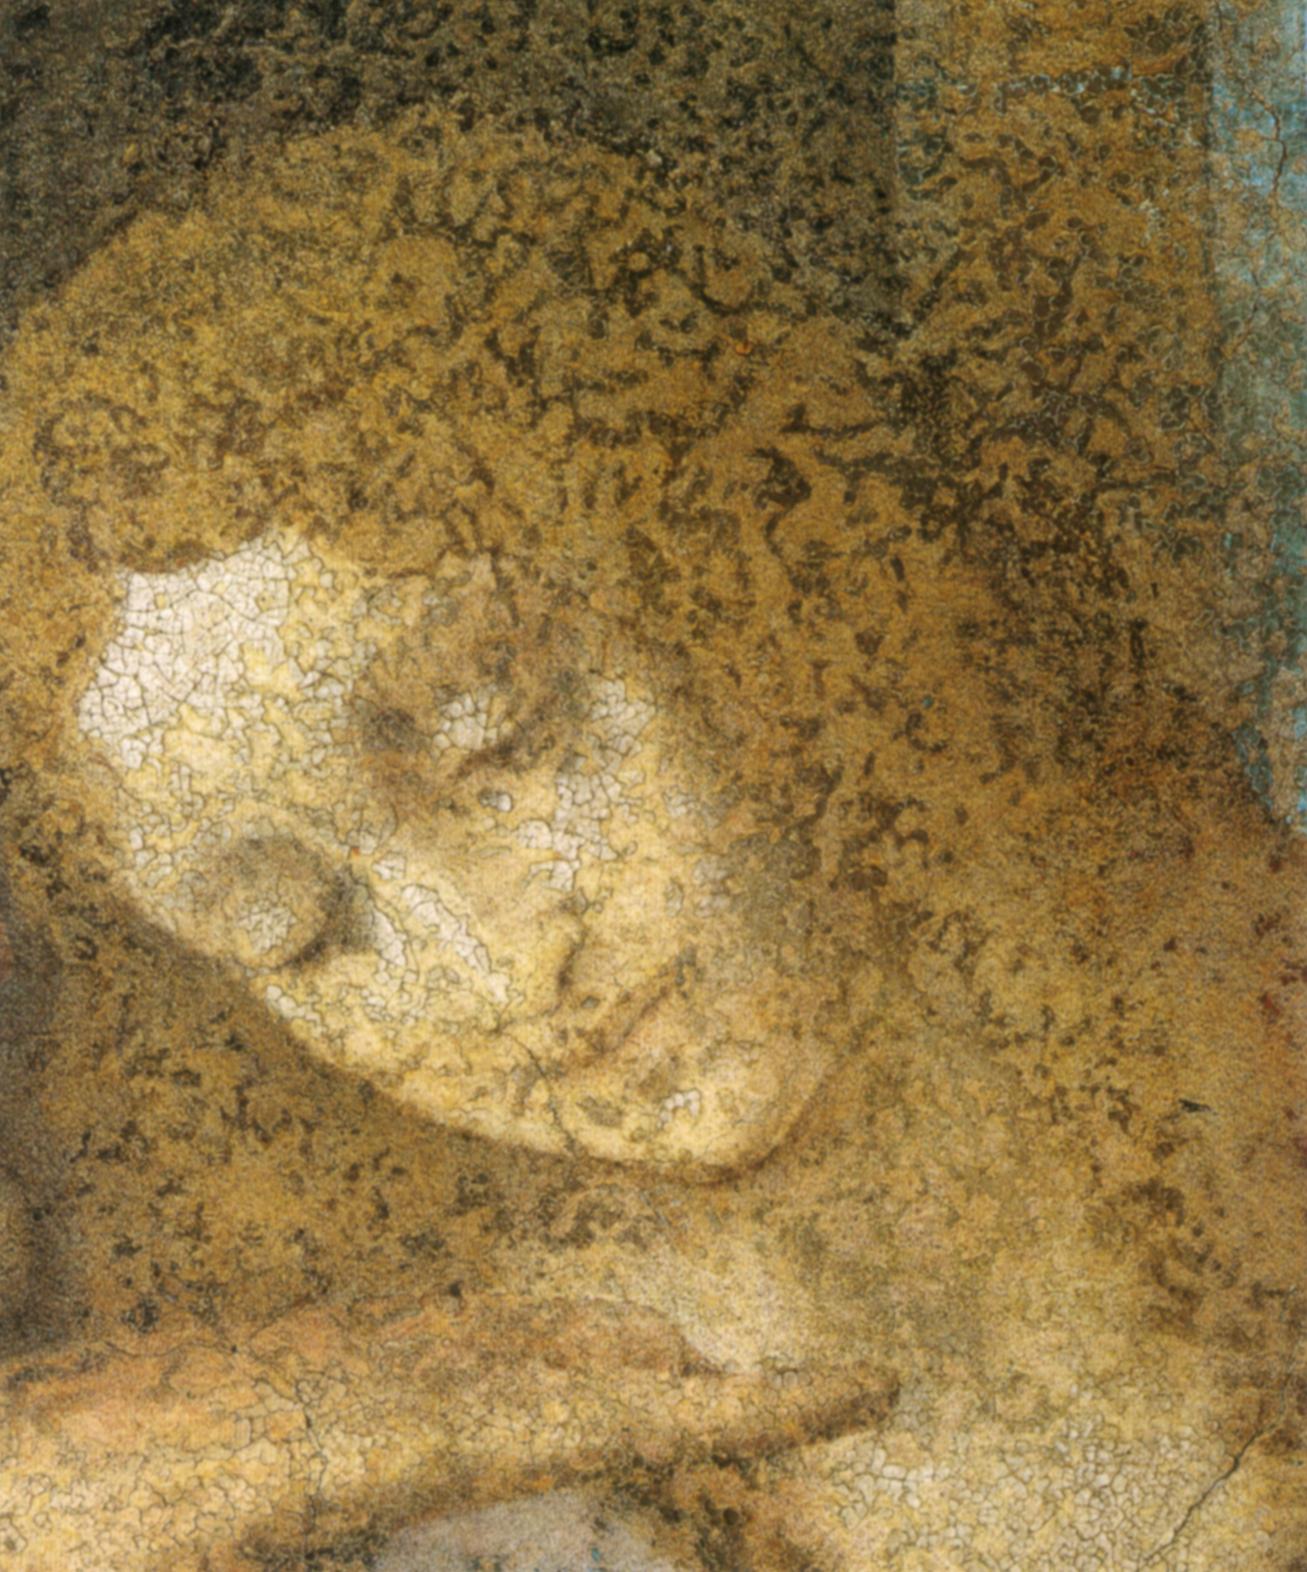 Print la cene leonard de vinci on canvas - Photo leonard de vinci ...